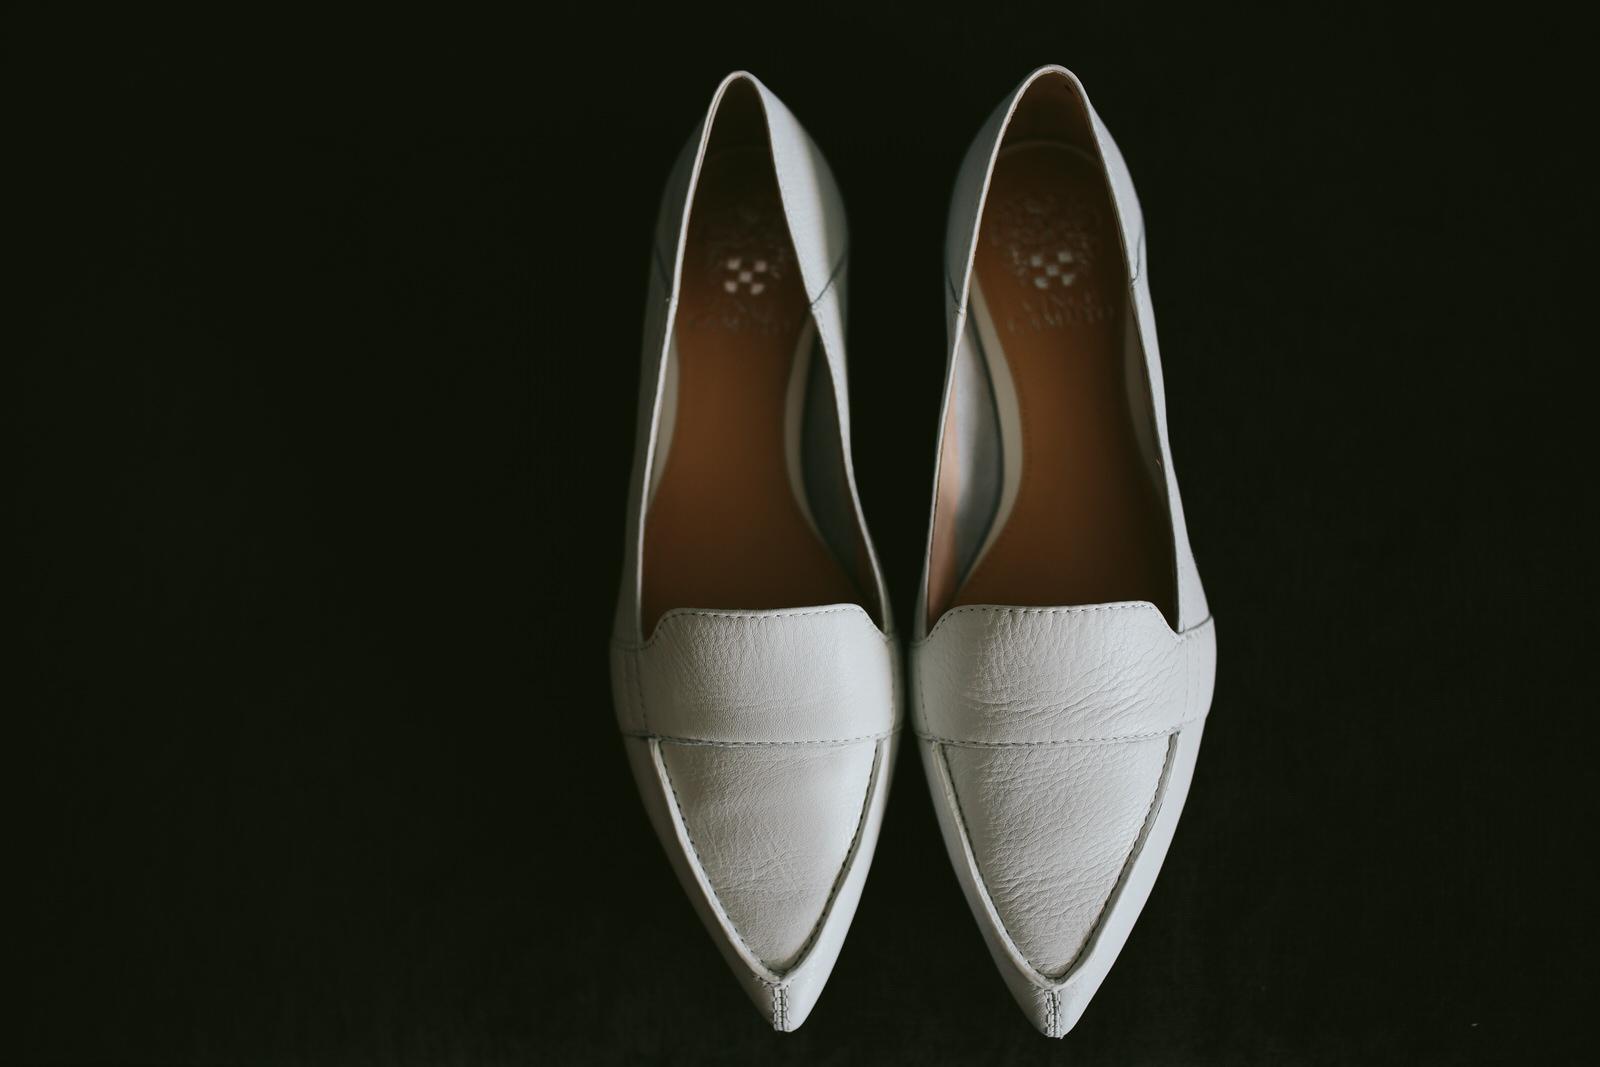 bride_shoes_tiny_house_photo_wedding_details.jpg